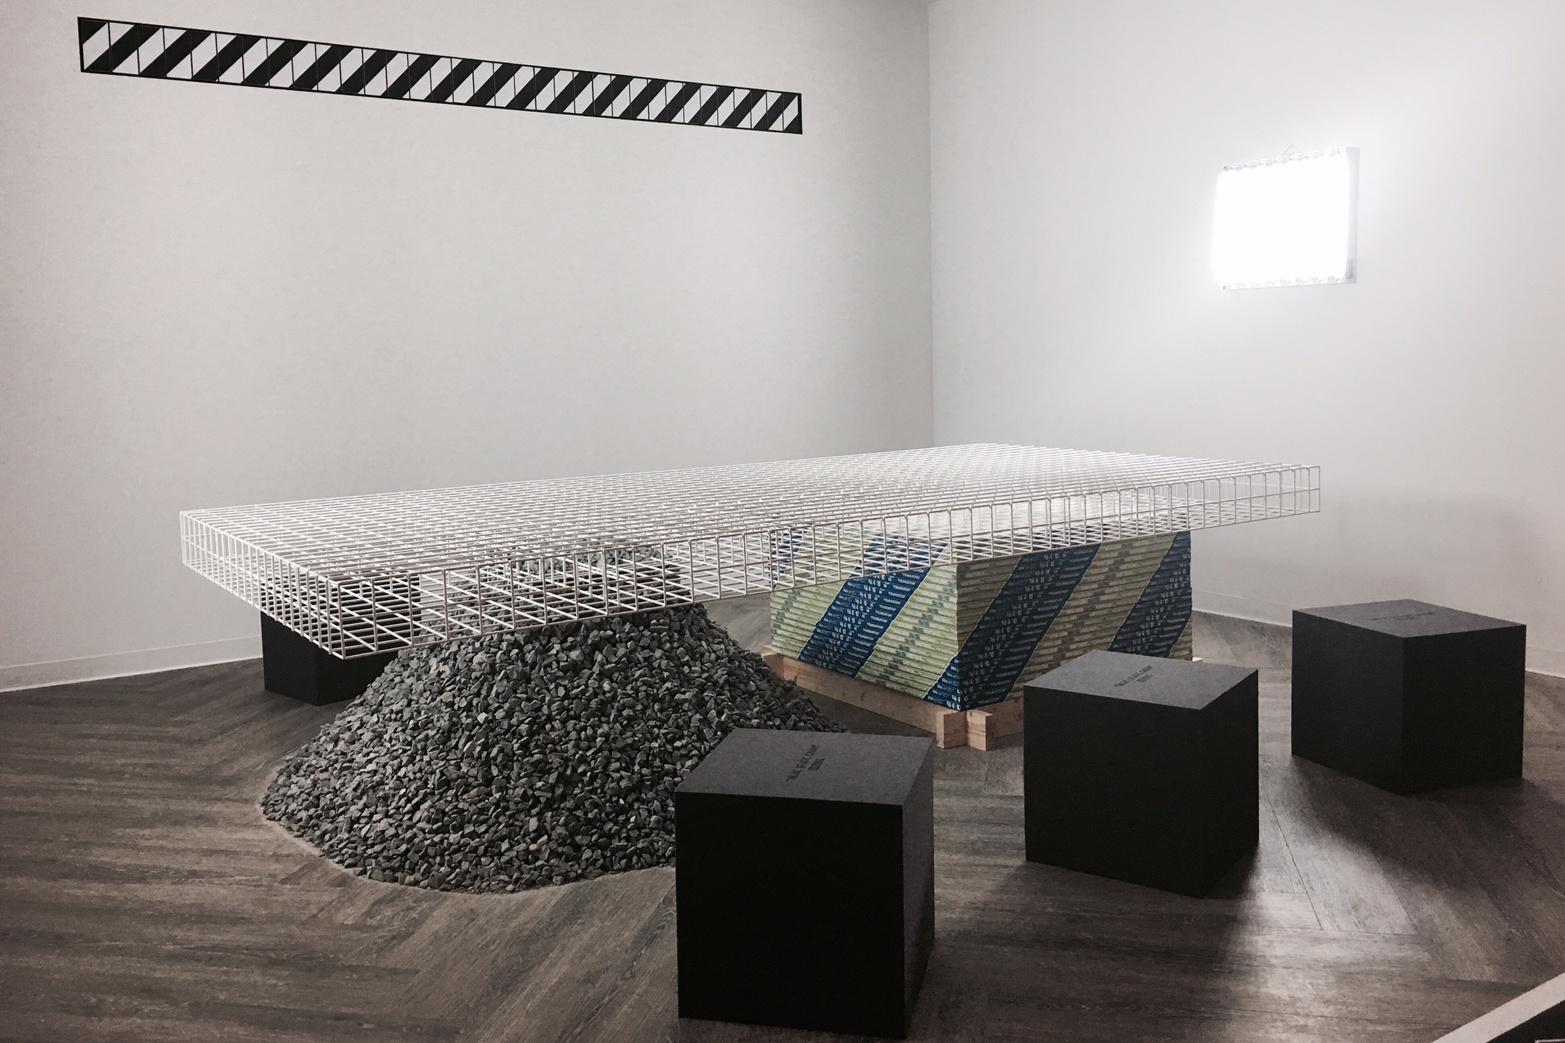 Installation view of the OFF-WHITE exhibit at Design Miami/ 2016.